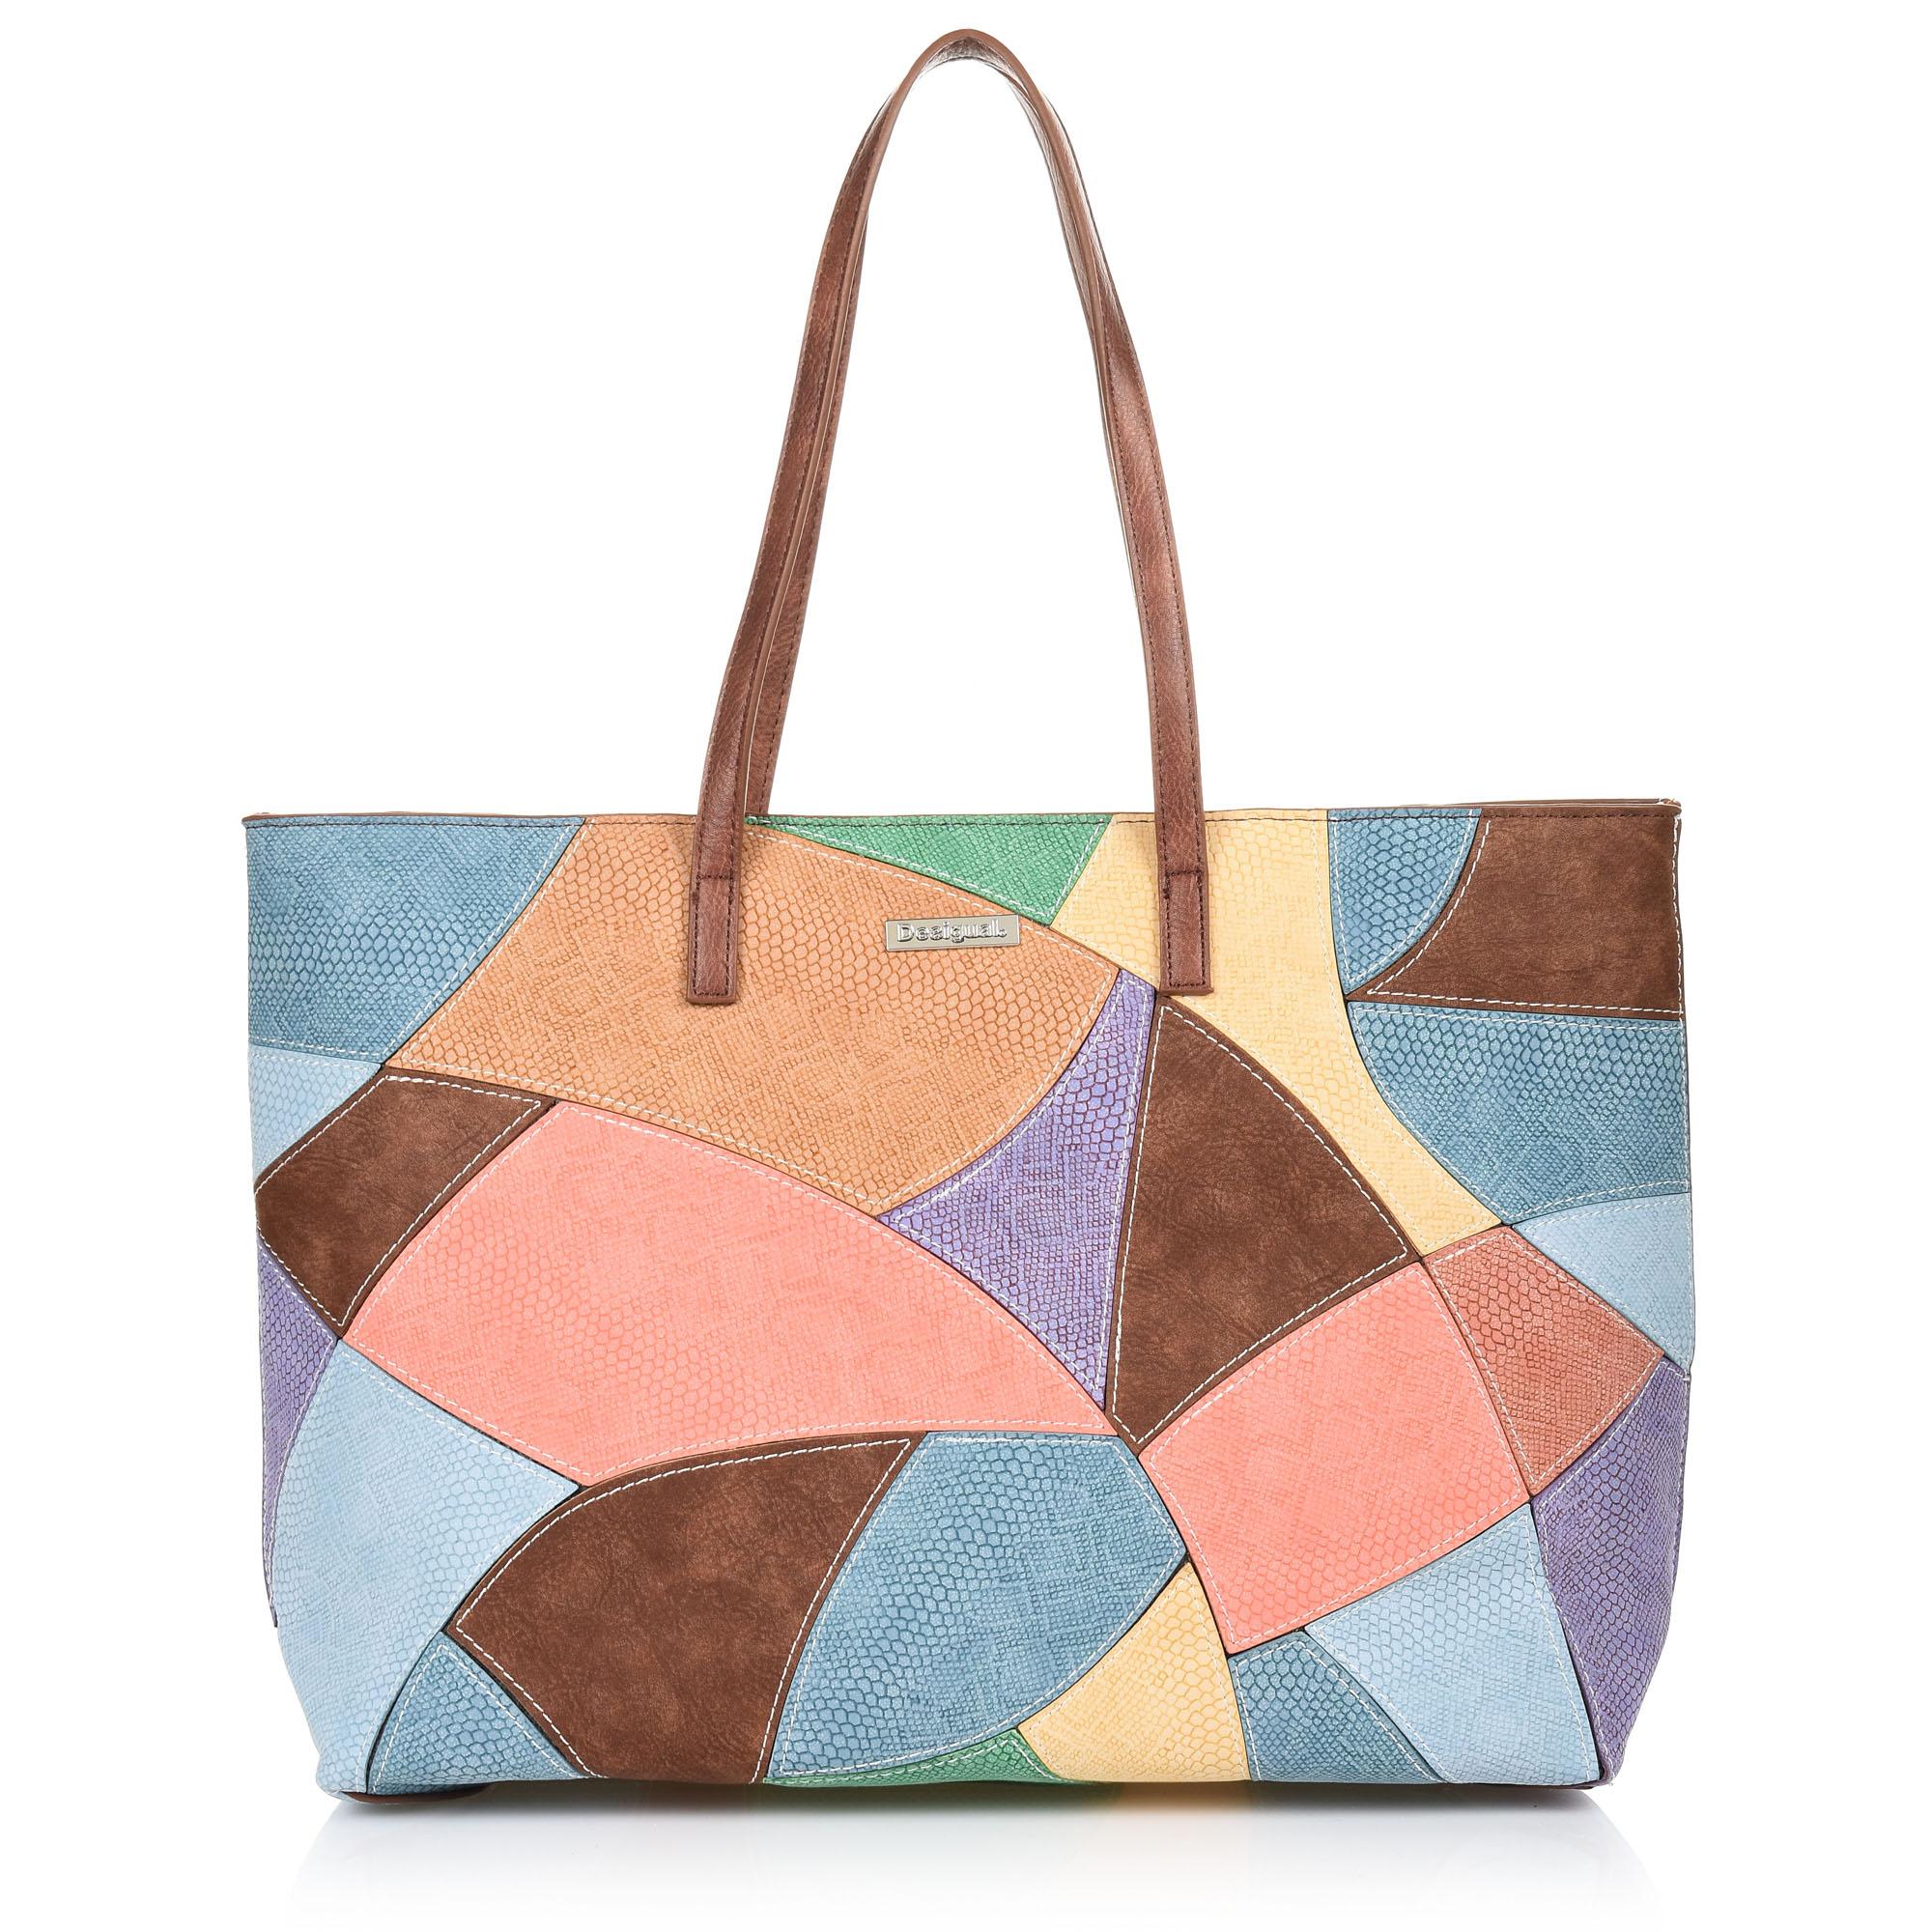 a7e2de54f3 Brand Bags Τσάντα Ώμου Desigual Bols Jackie Redmond 19SAXPFZ